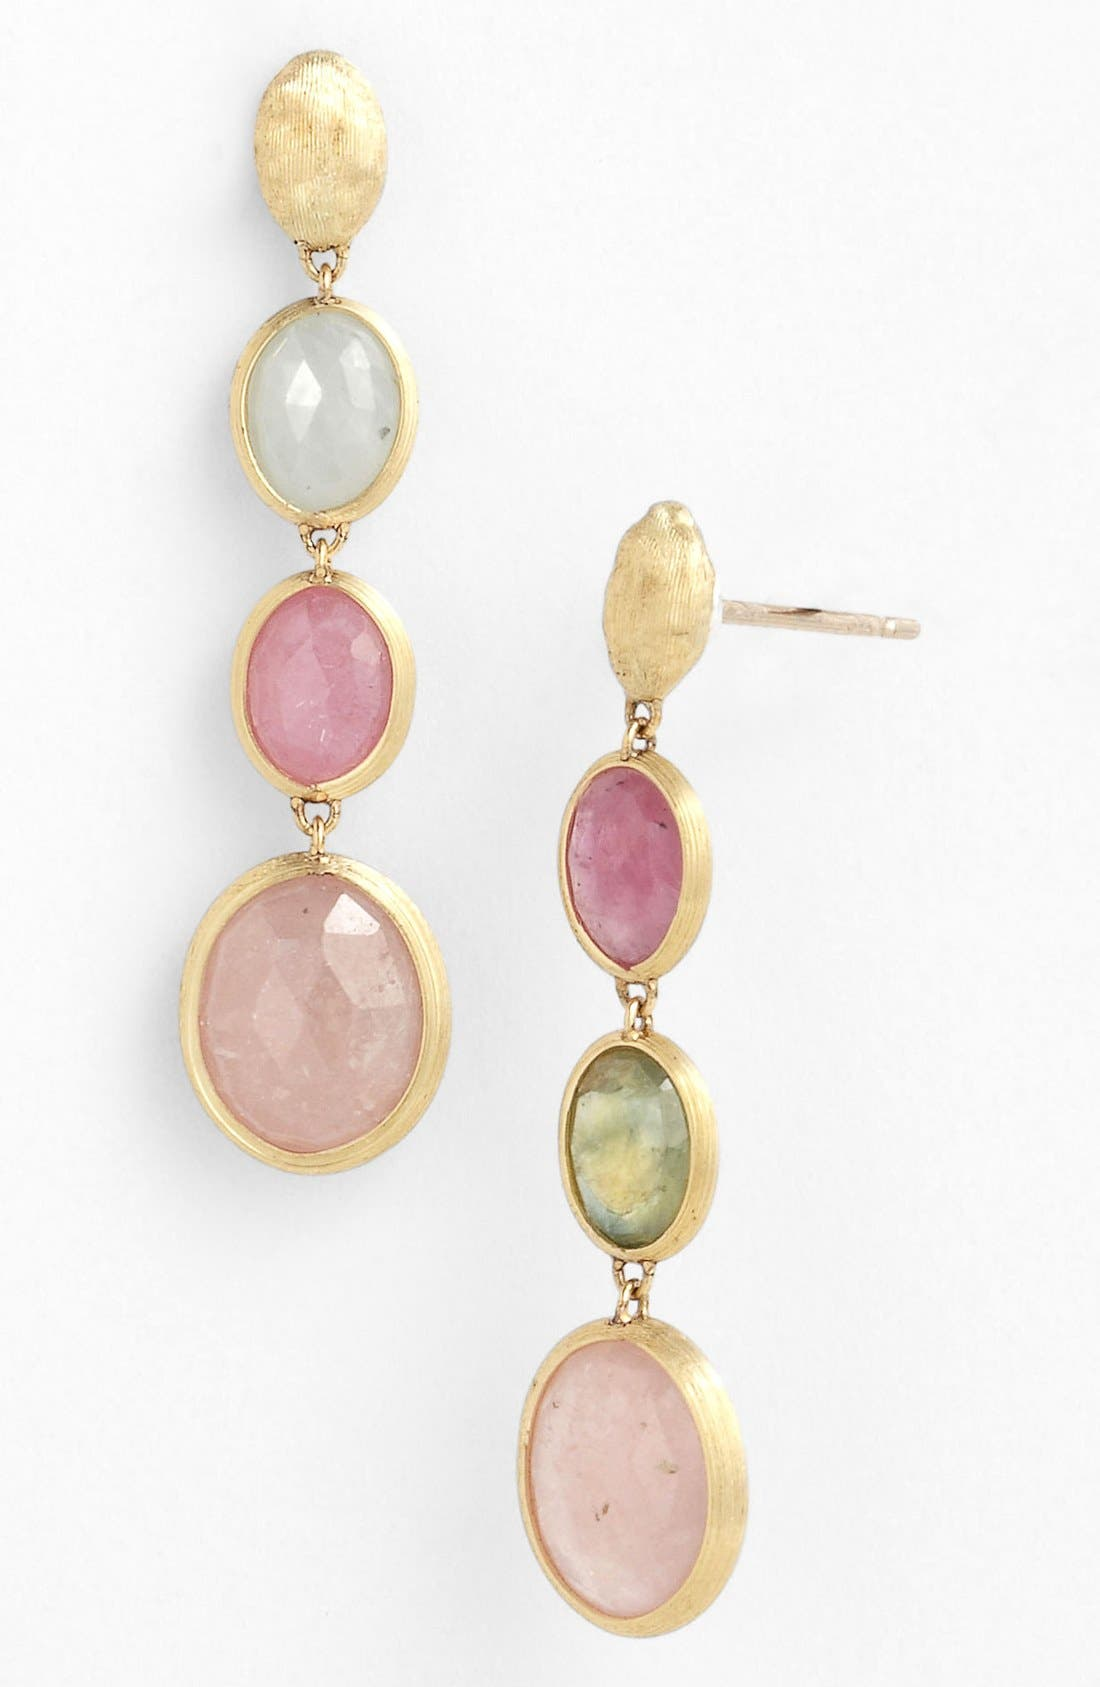 Main Image - Marco Bicego 'Siviglia' Stone Drop Earrings